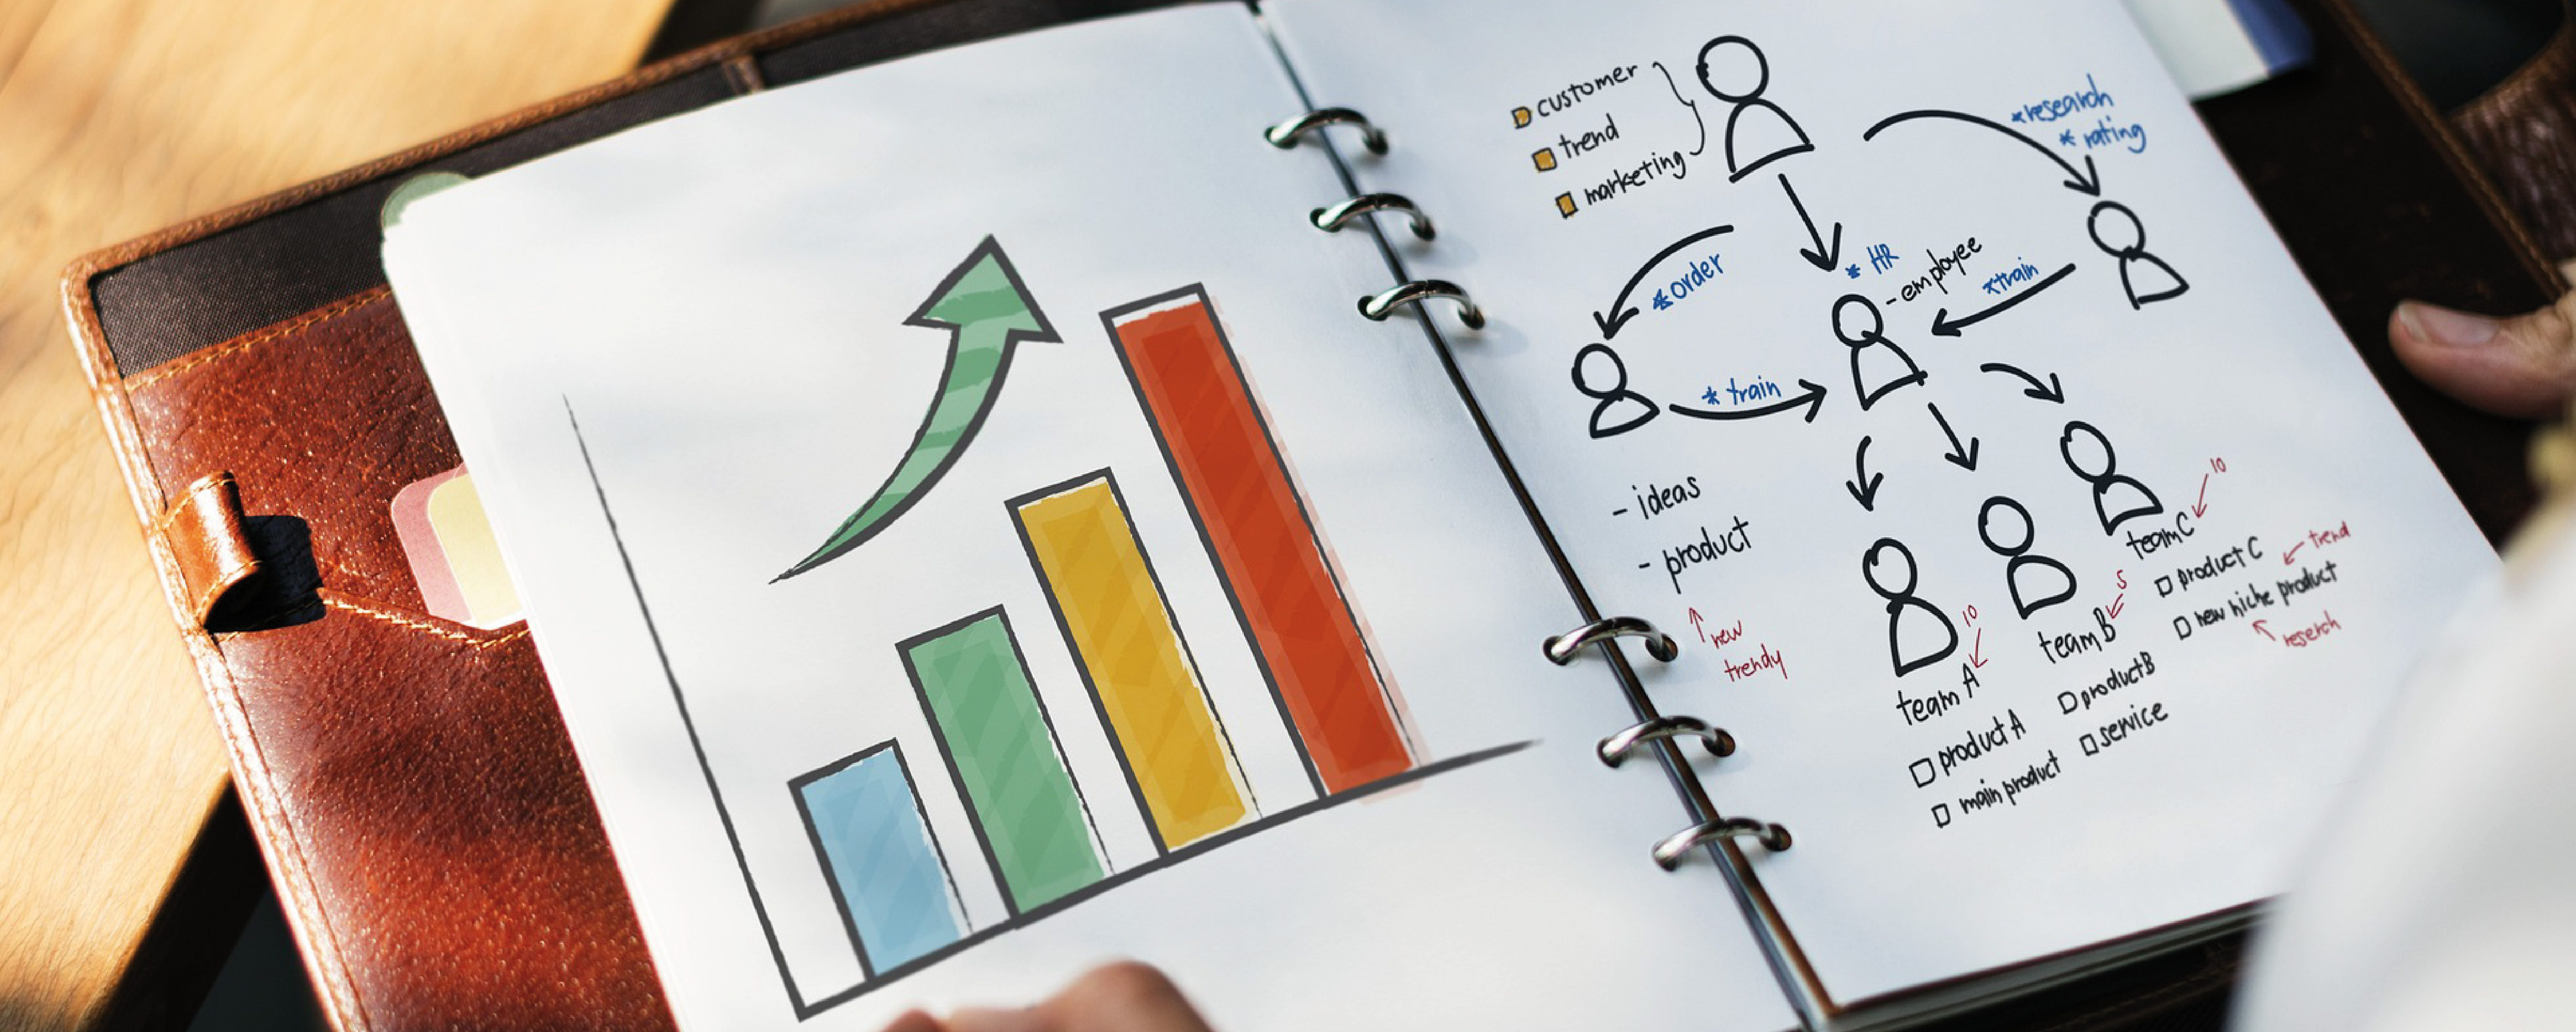 Diferentes gráficos que representan a la investigación de mercados